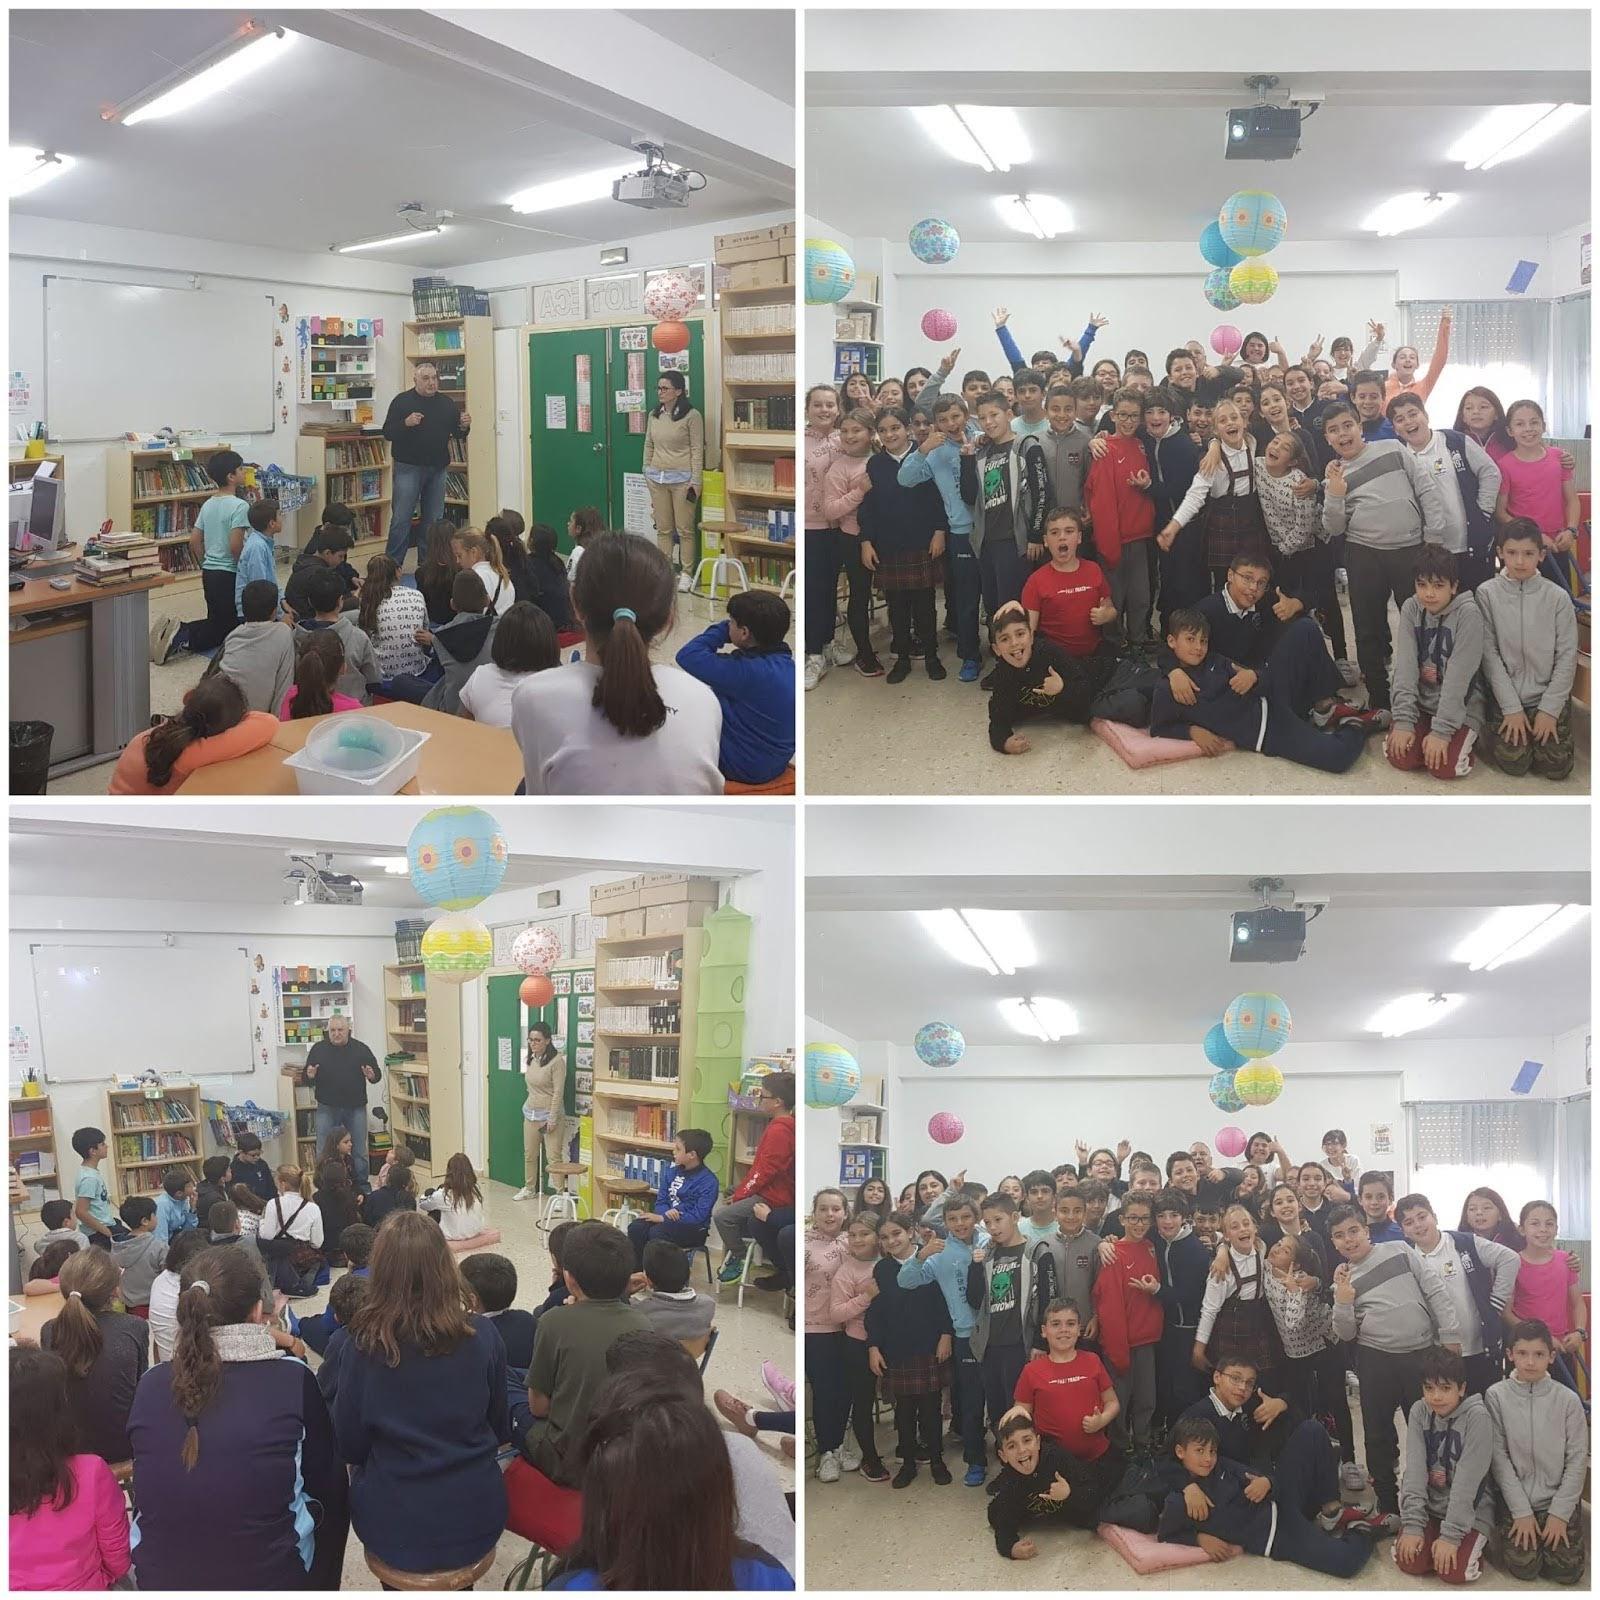 125 alumnos del CEIP Inmaculada aprenden con Mayor-Net a prevenir el Ciberbullying